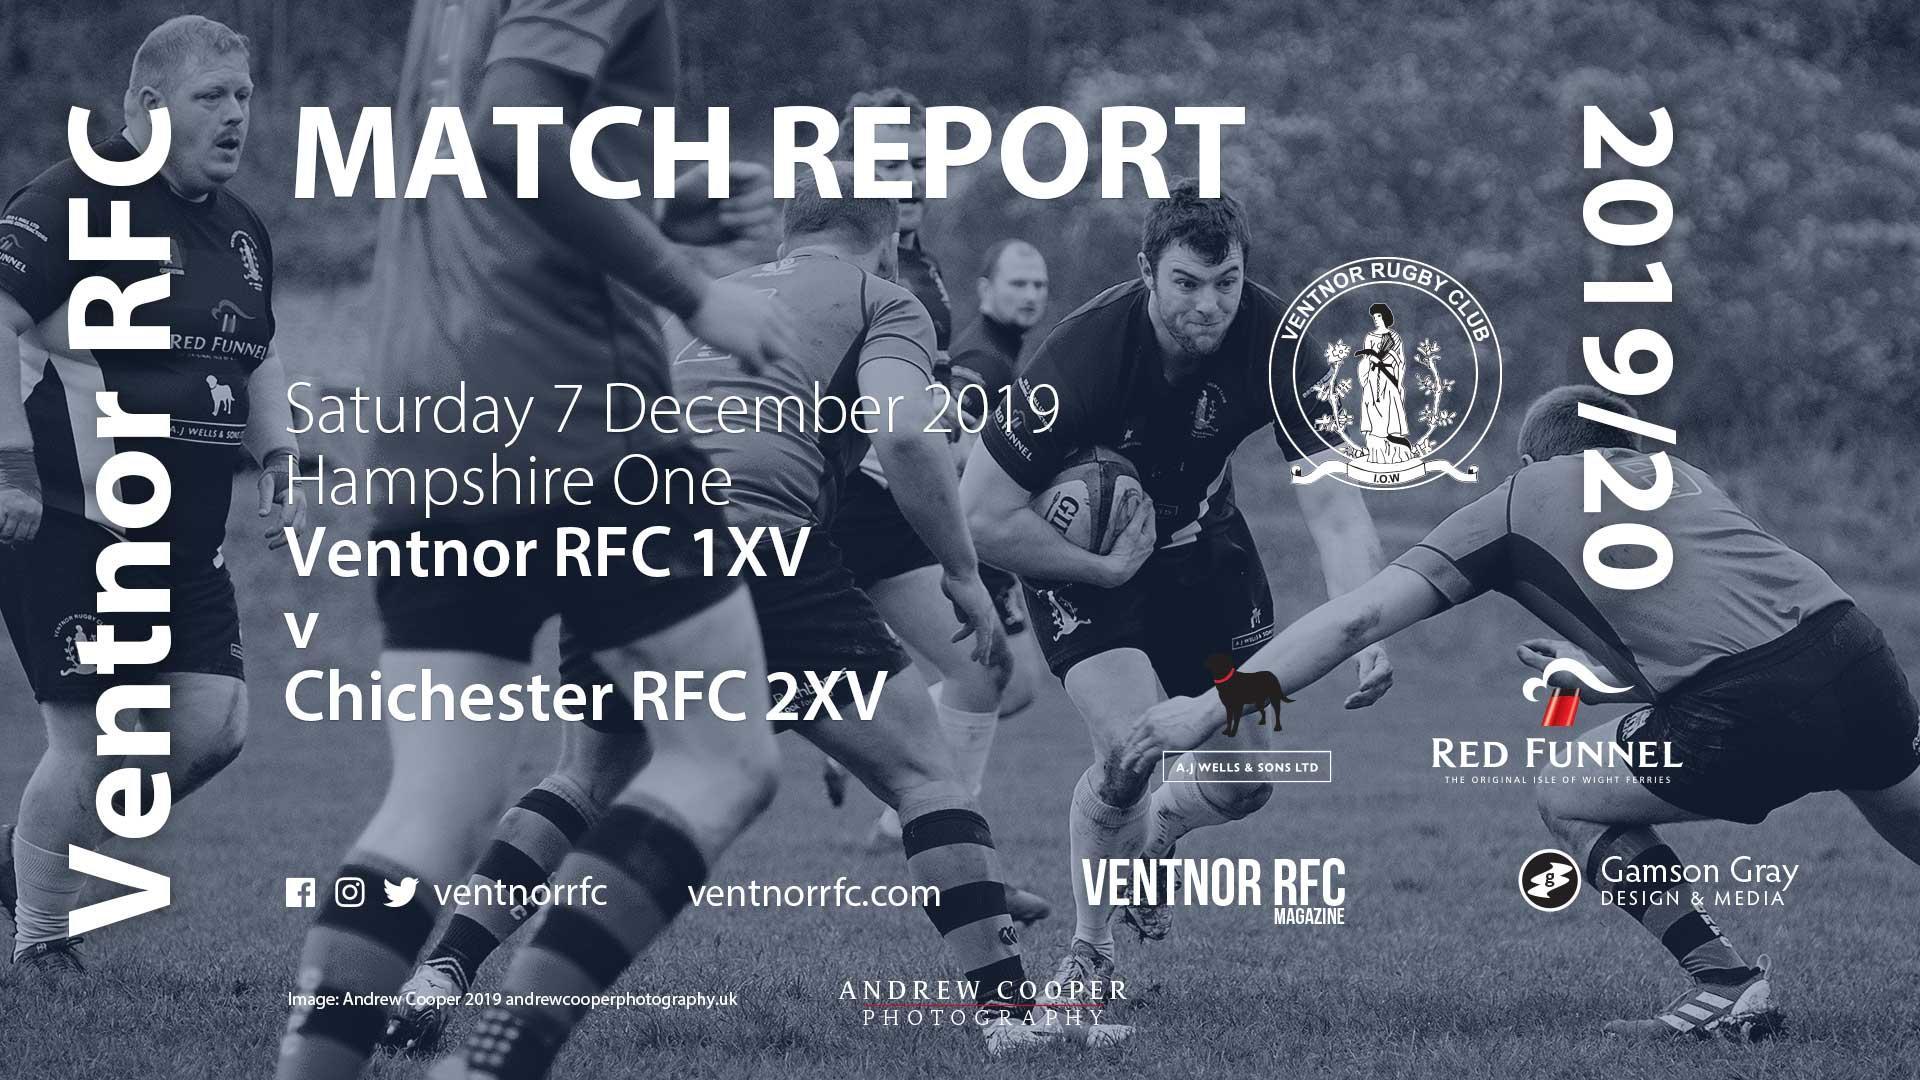 ventnor-rfc-1xv-v-chichester-rfc-2xv-match-report-07-december-2019-ventnor-rfc-facebook-news-1980